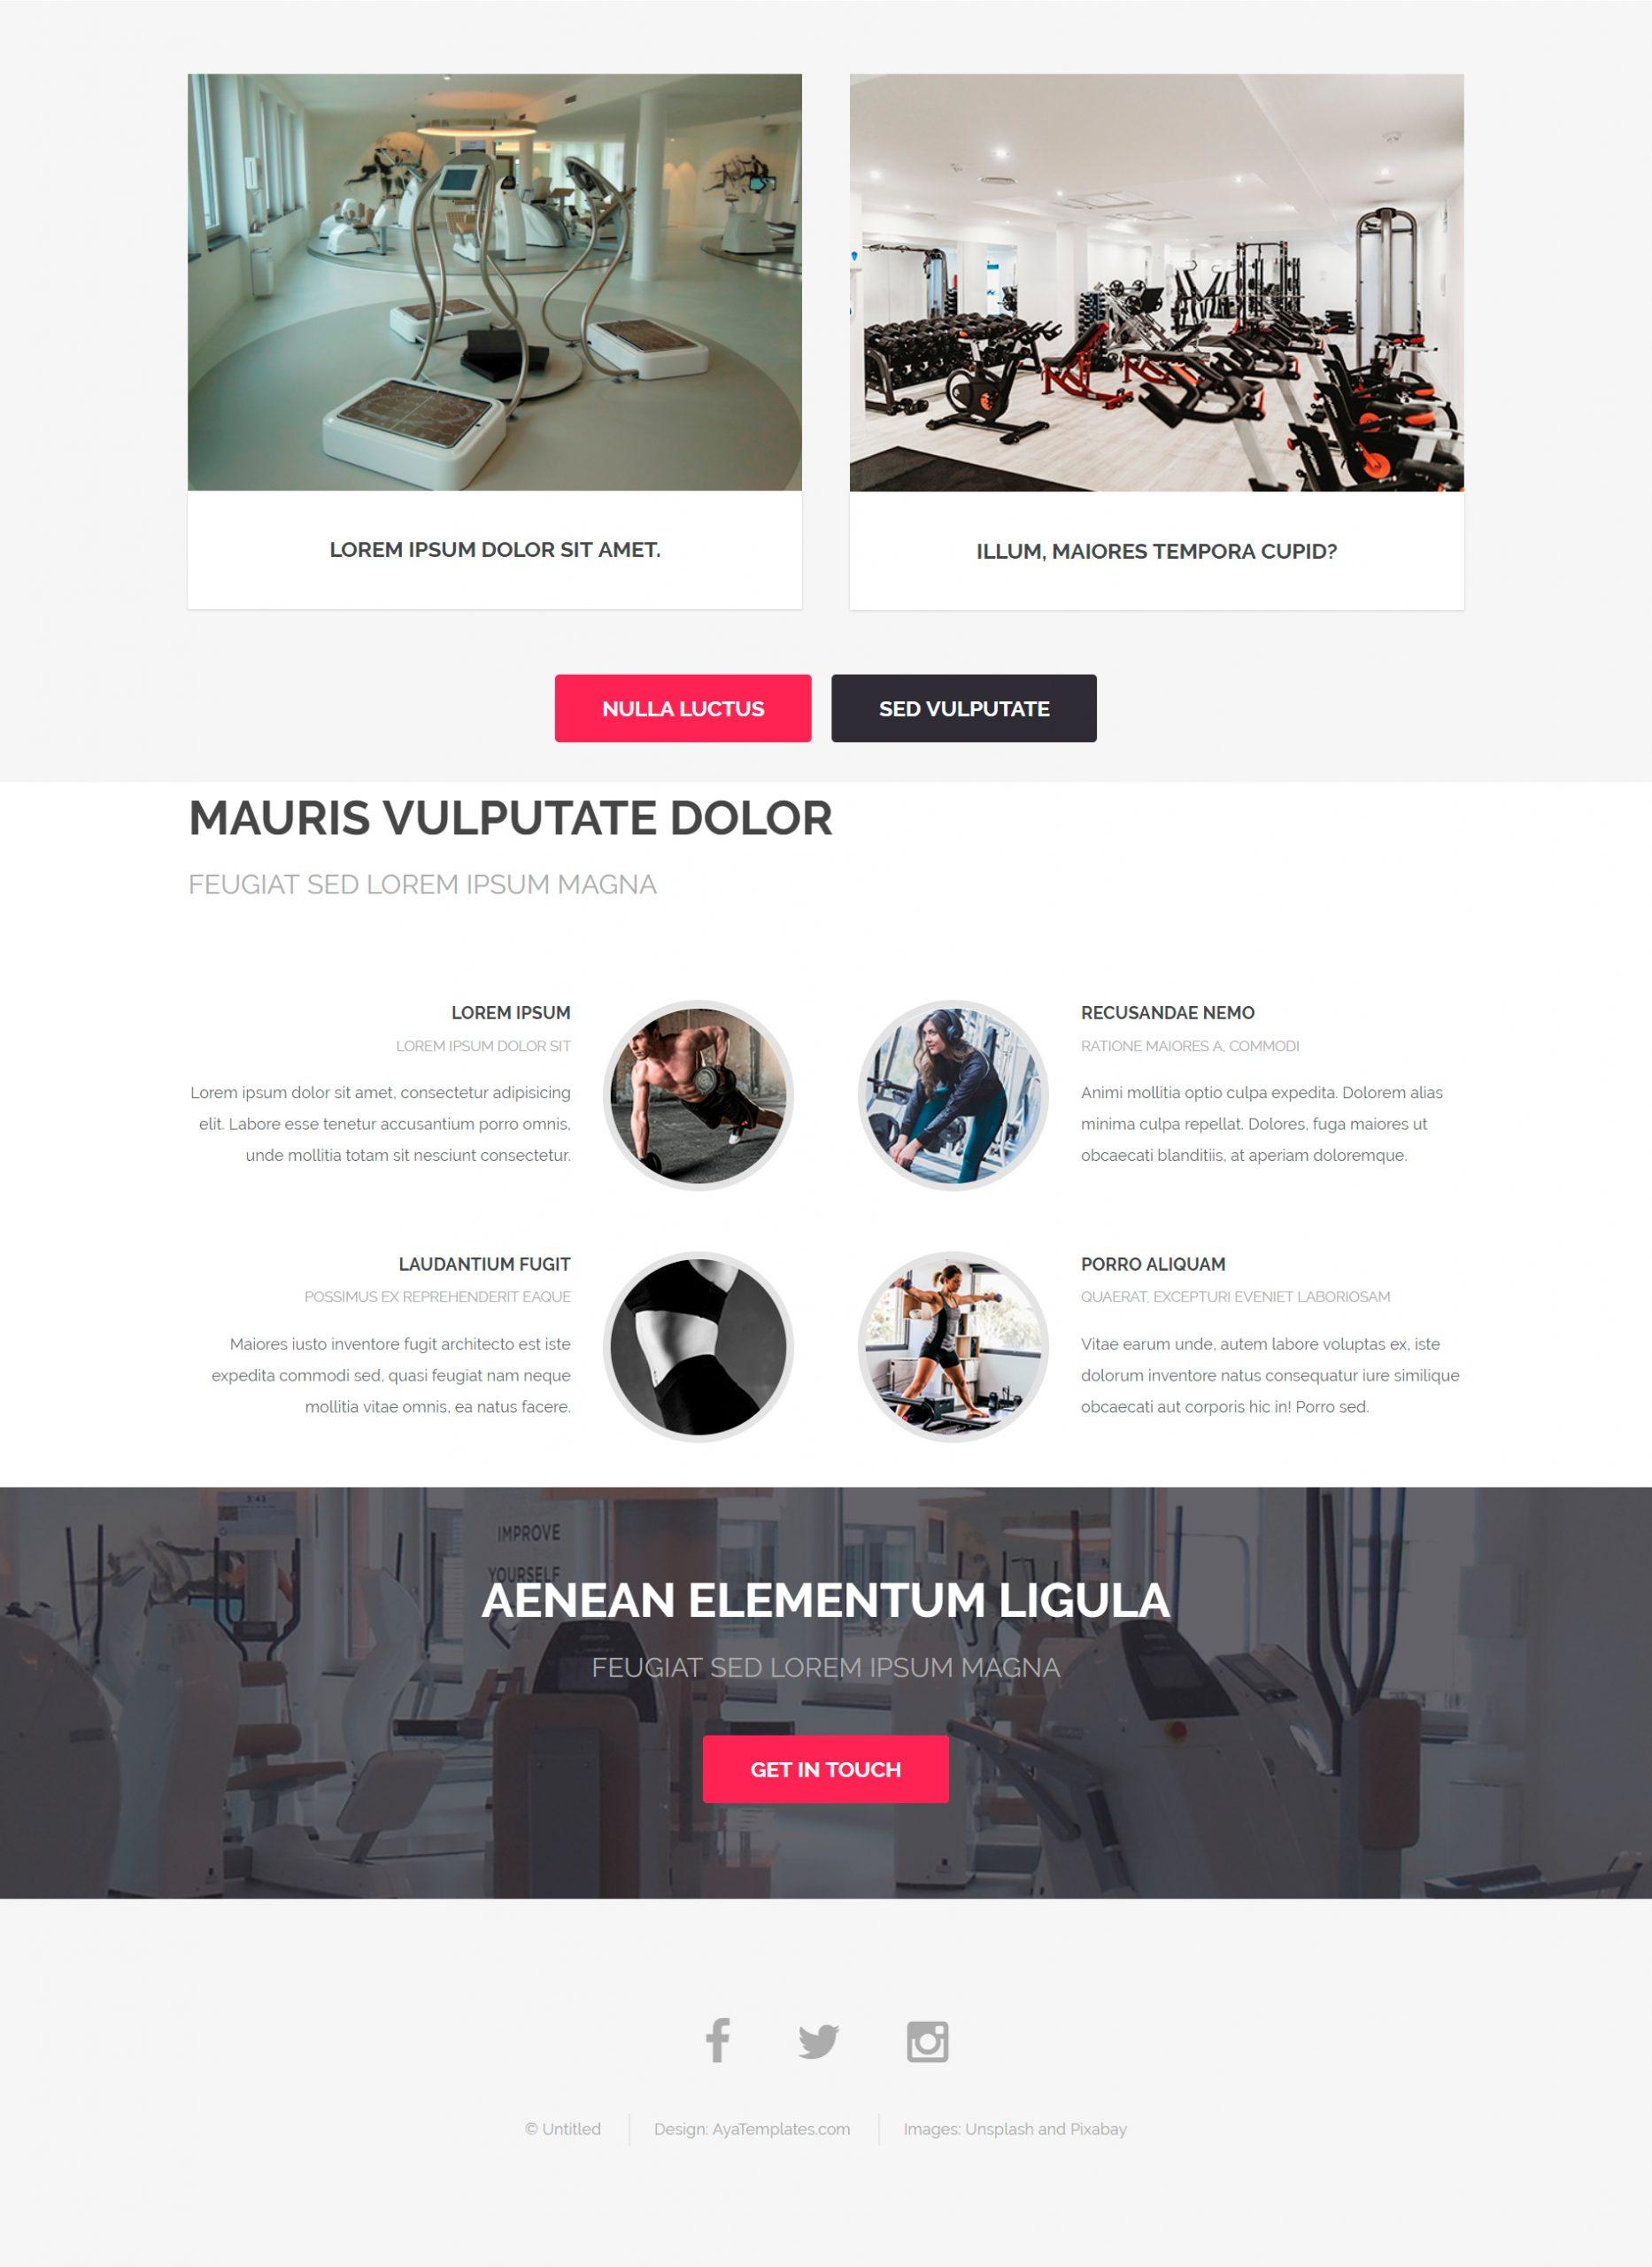 ayafitnessclub-css-designed-site-content-homepage